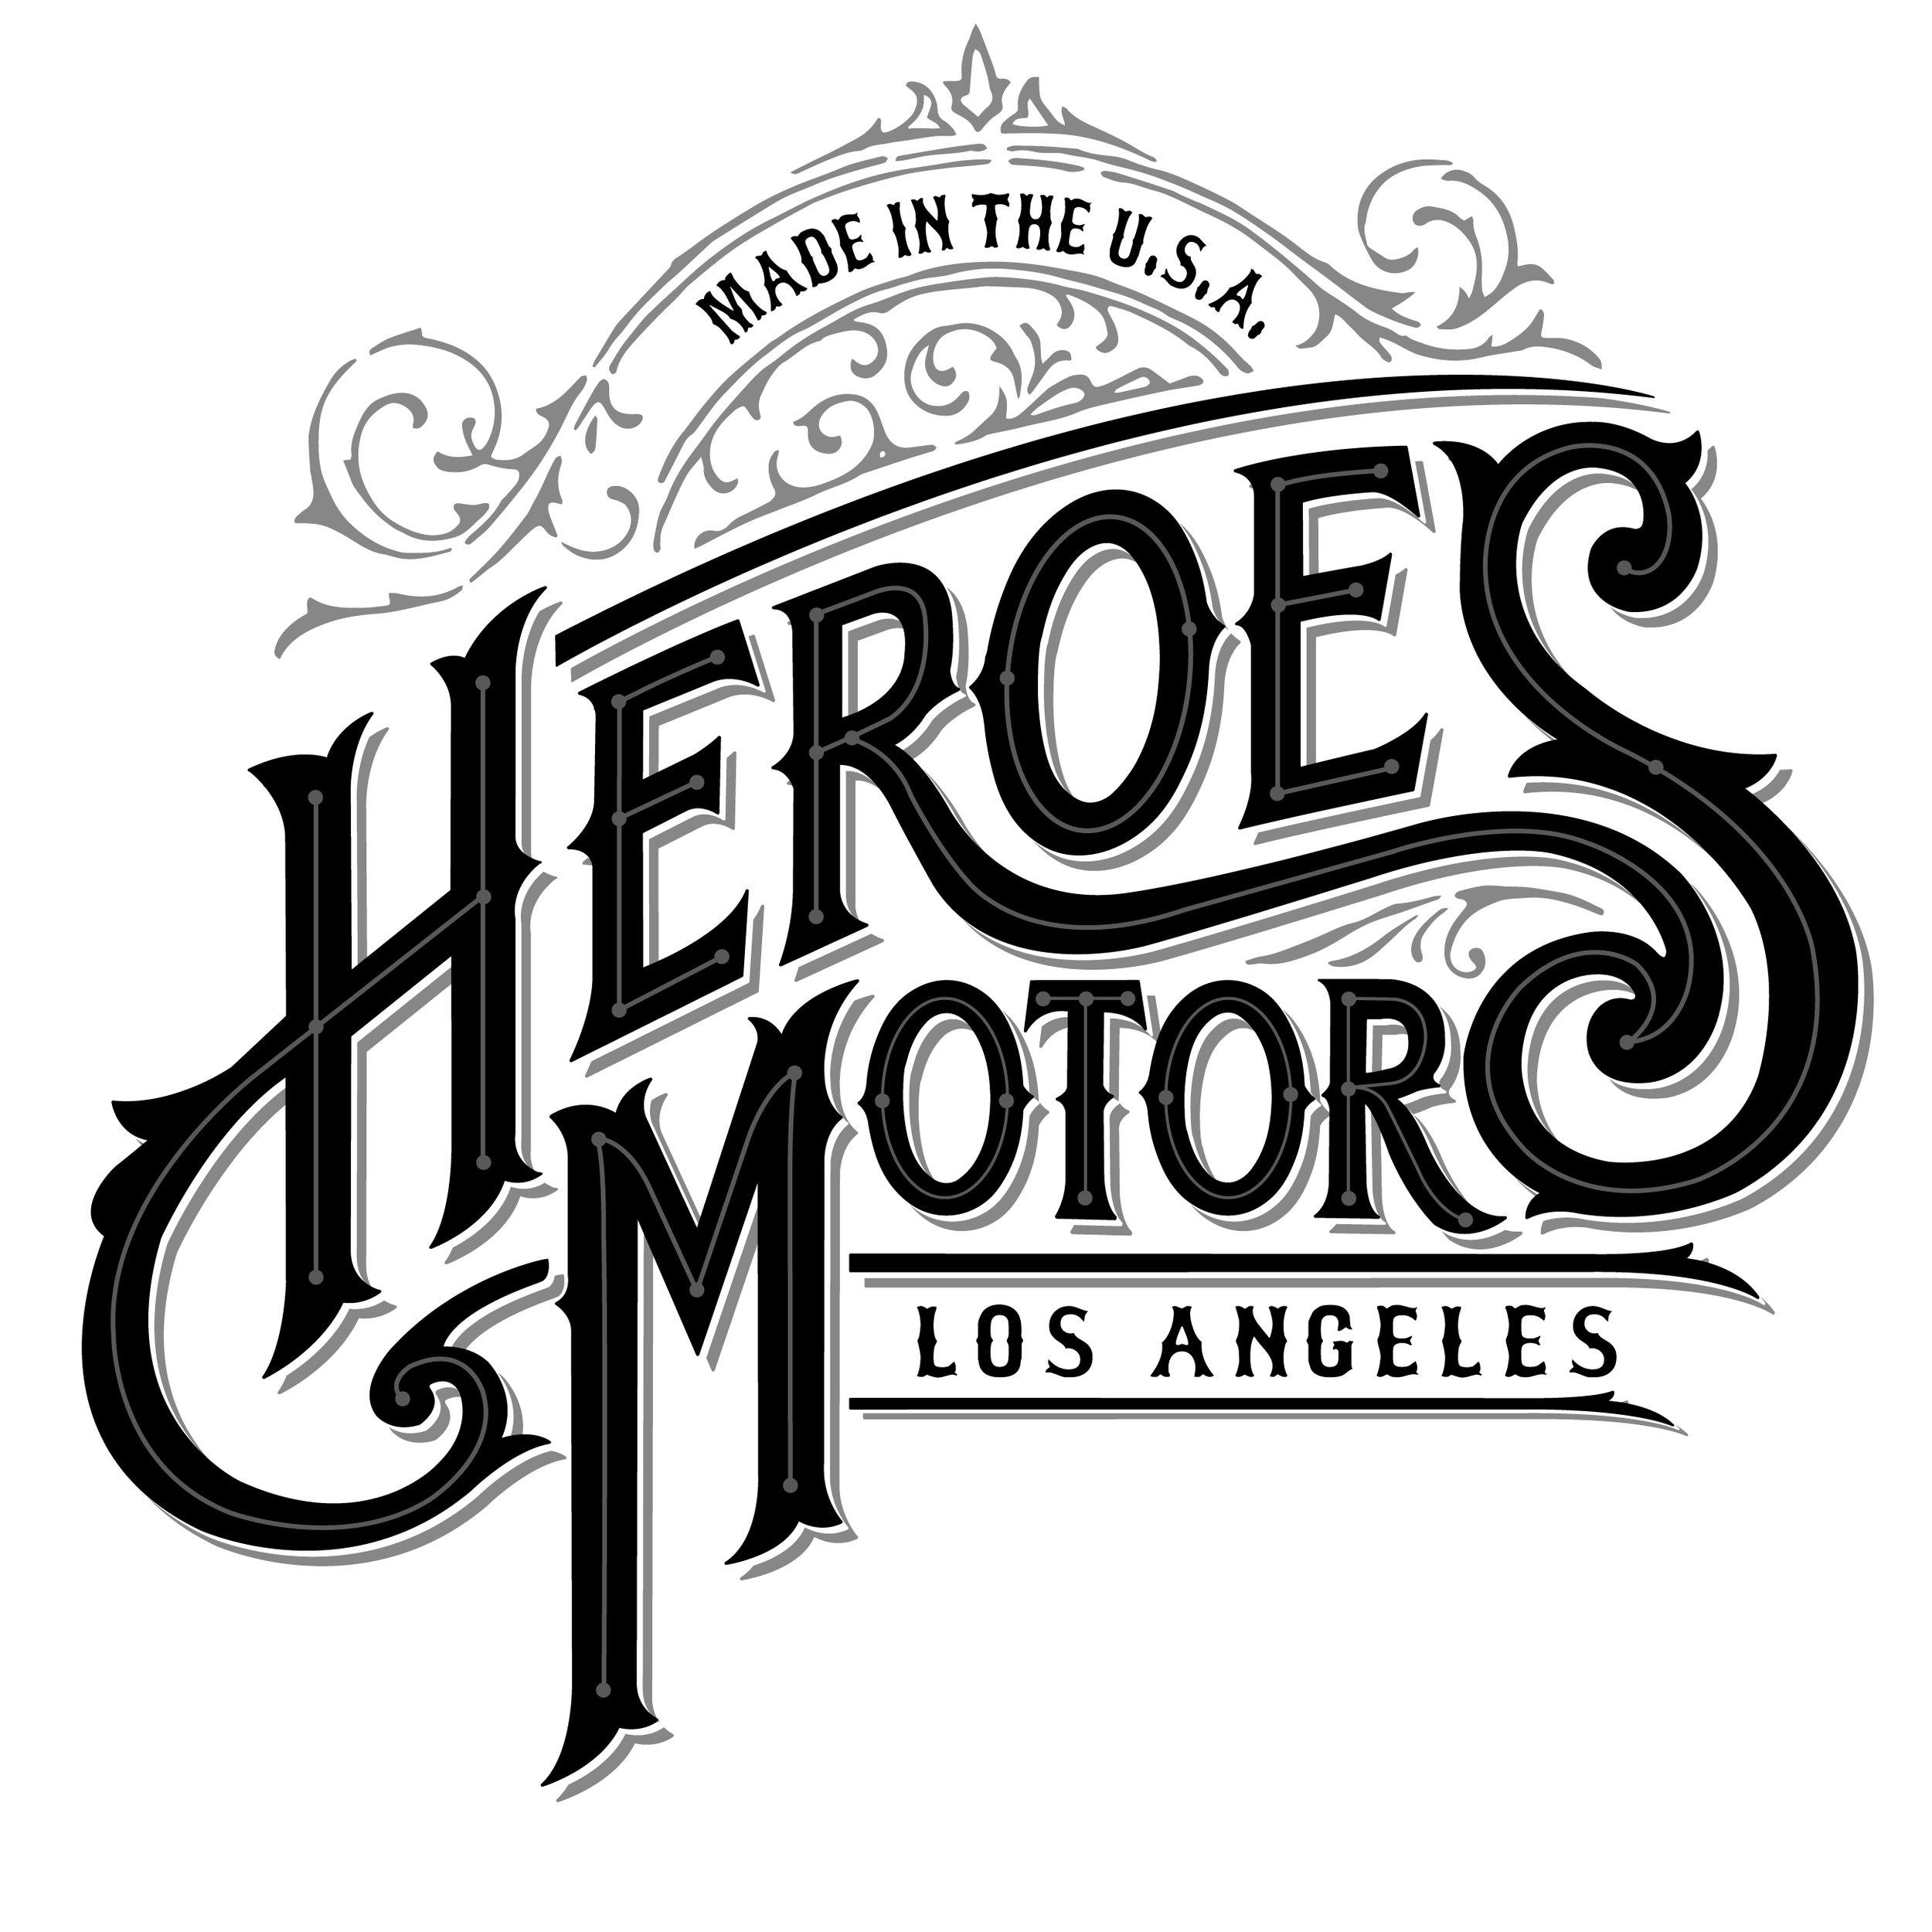 heroes-motorcycles_myshopify_com_logo.jpg